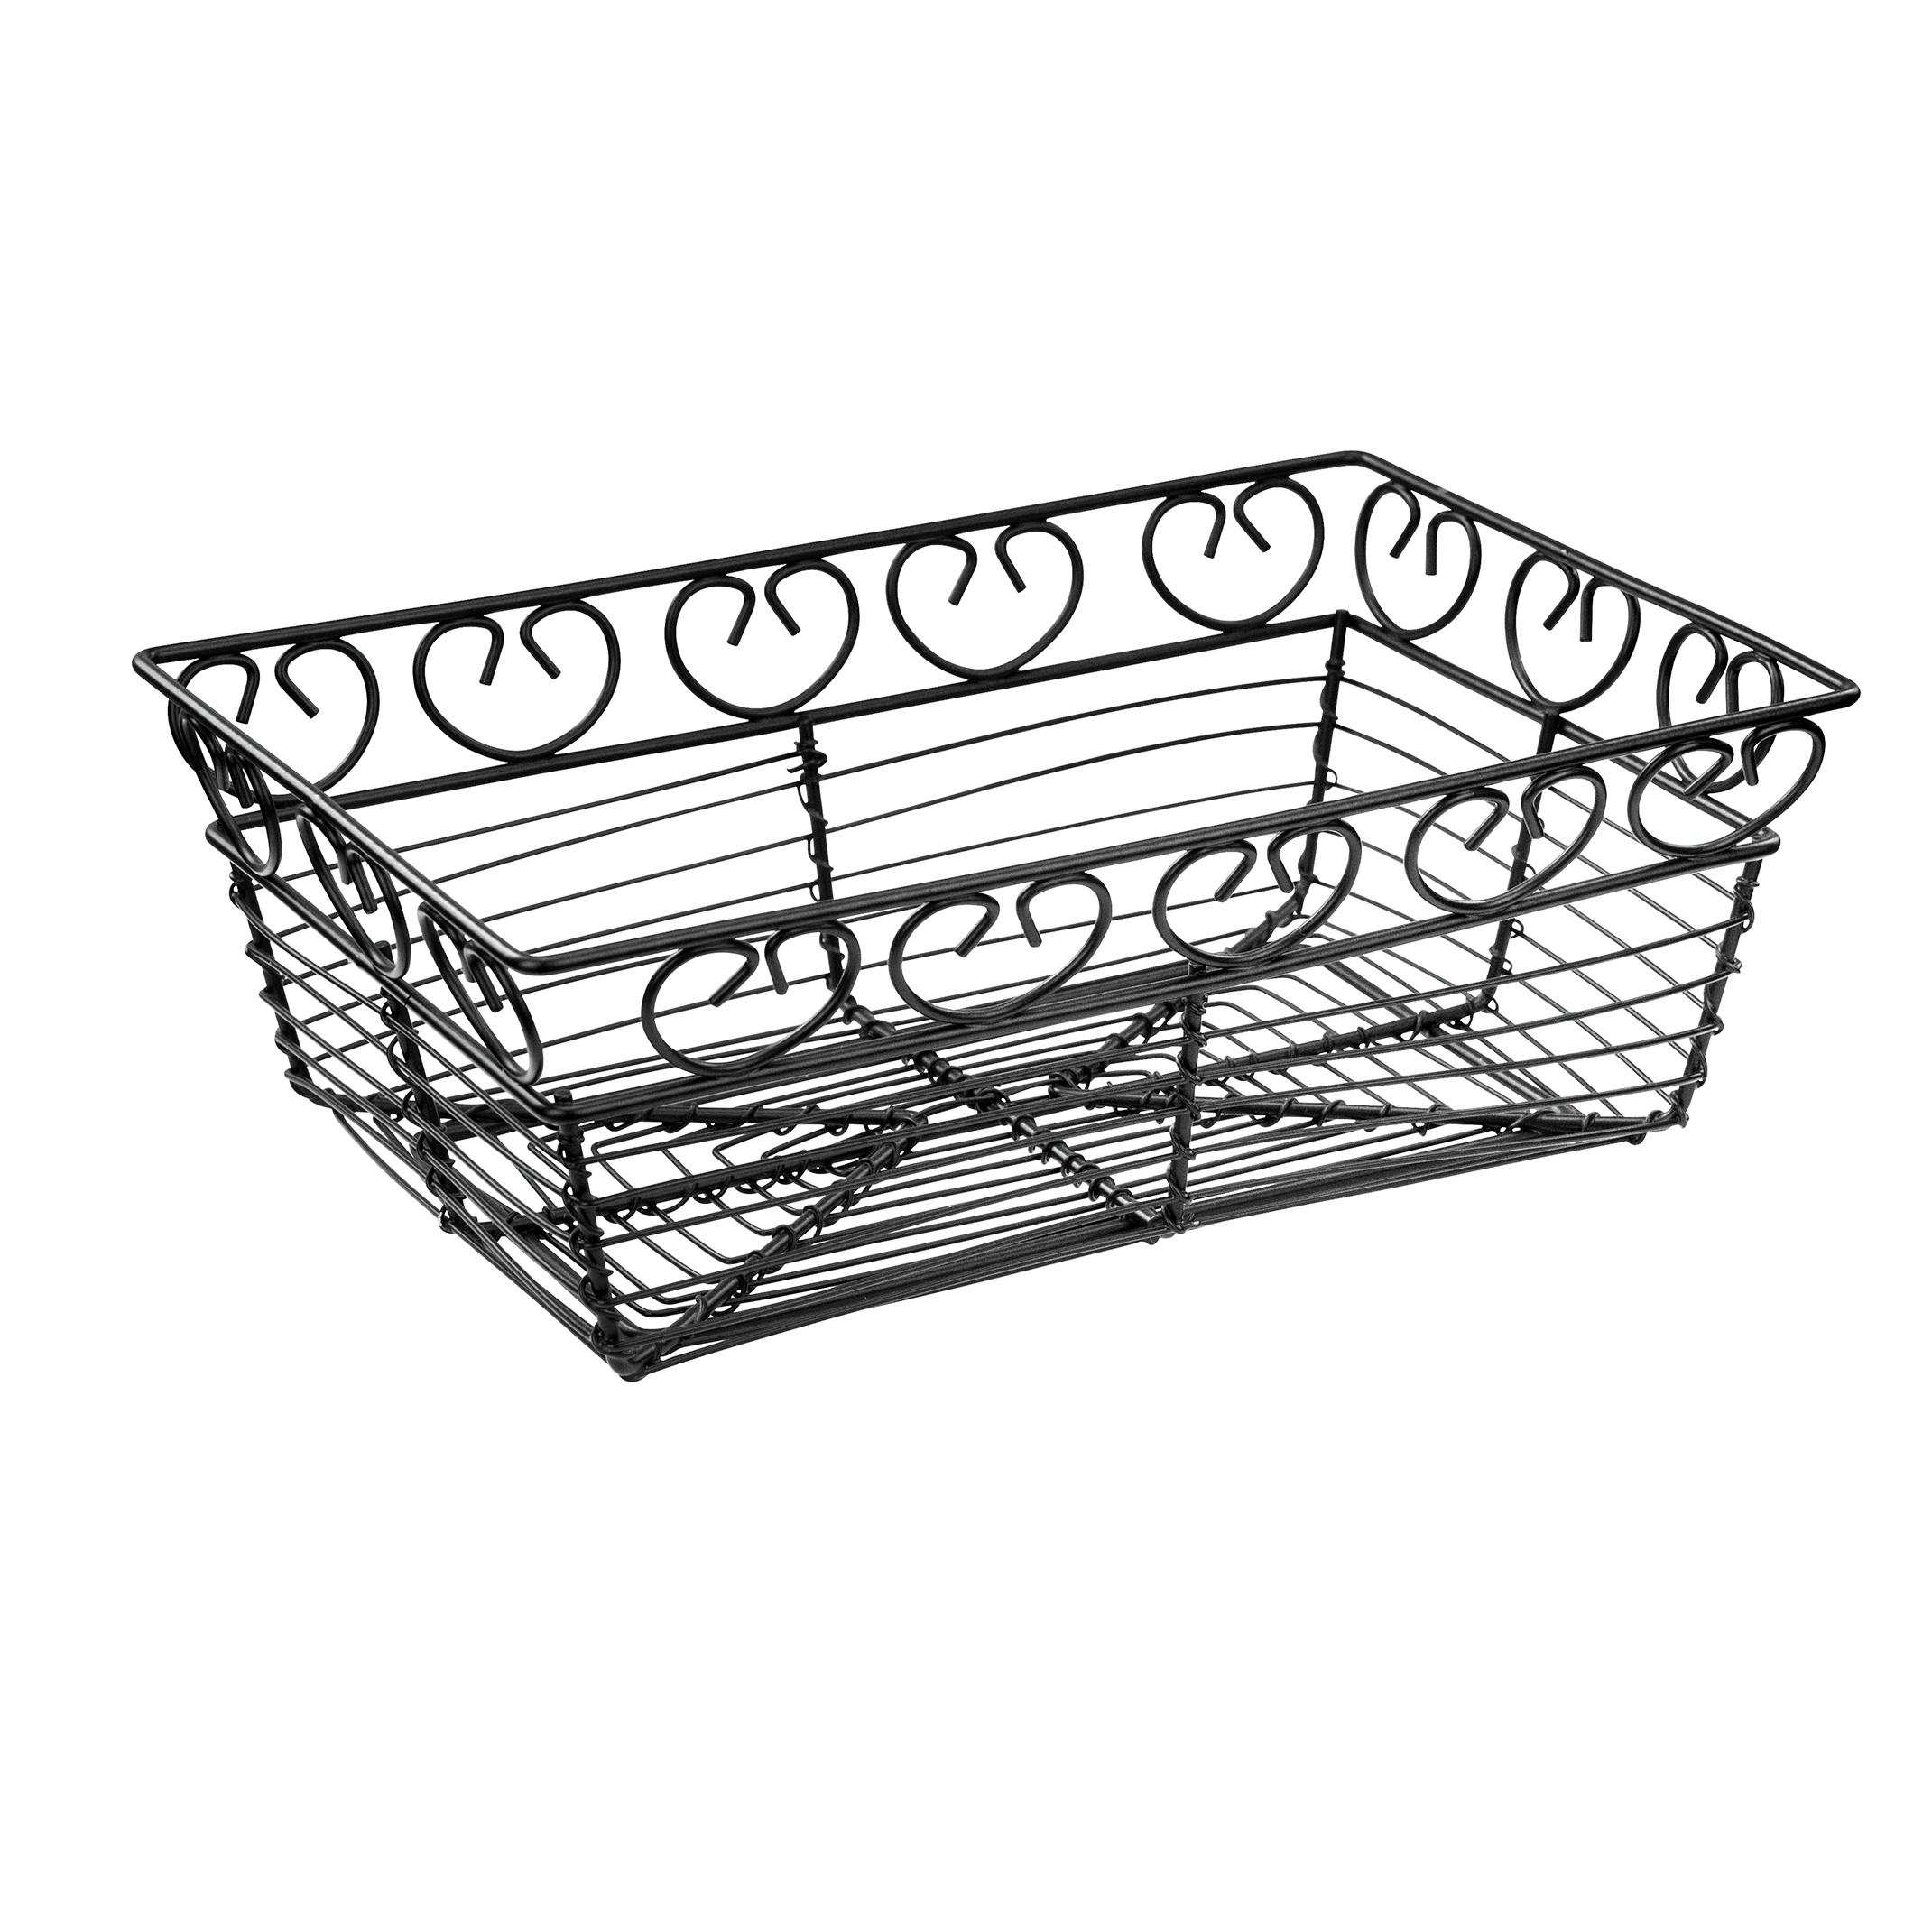 Winco WBKG-9 basket, tabletop, metal